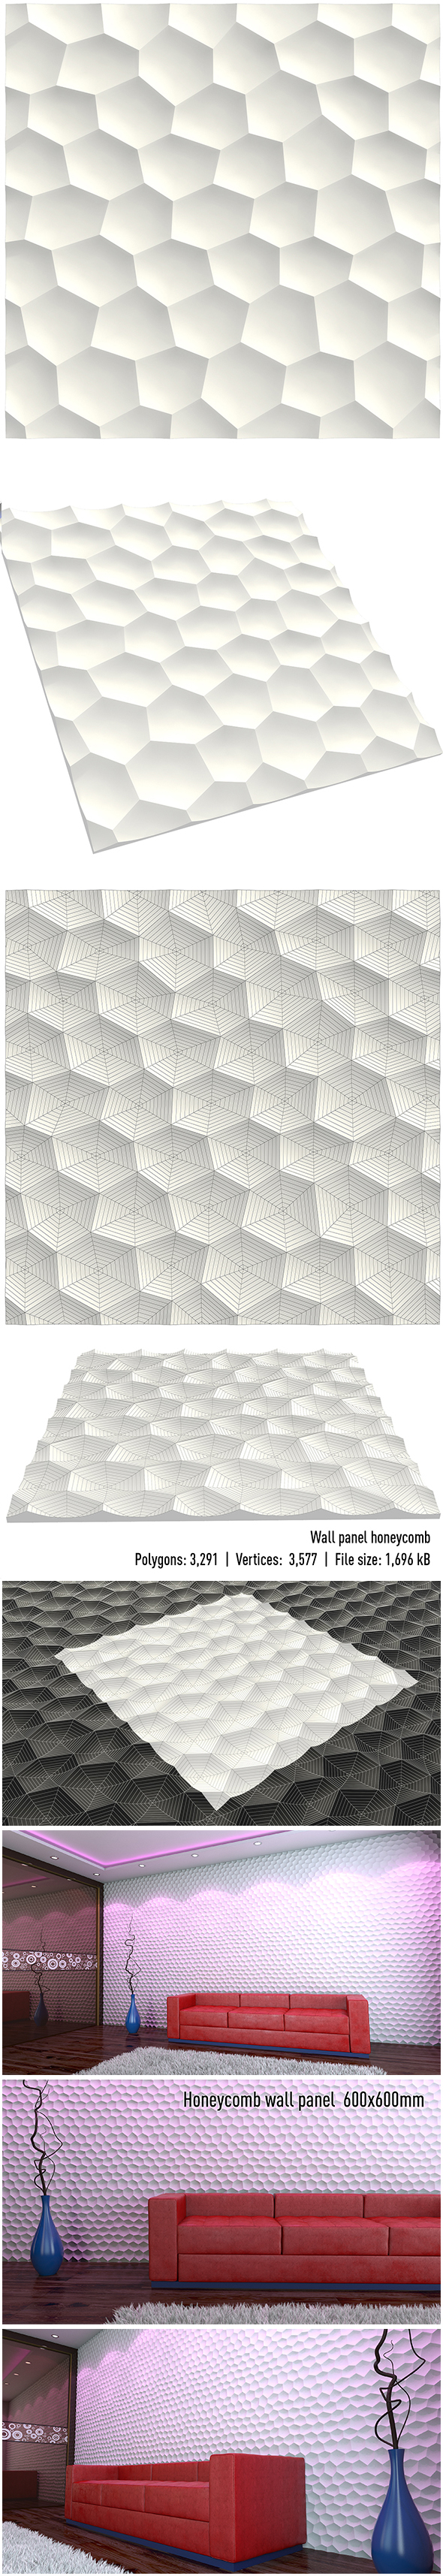 wall panel honeycomb